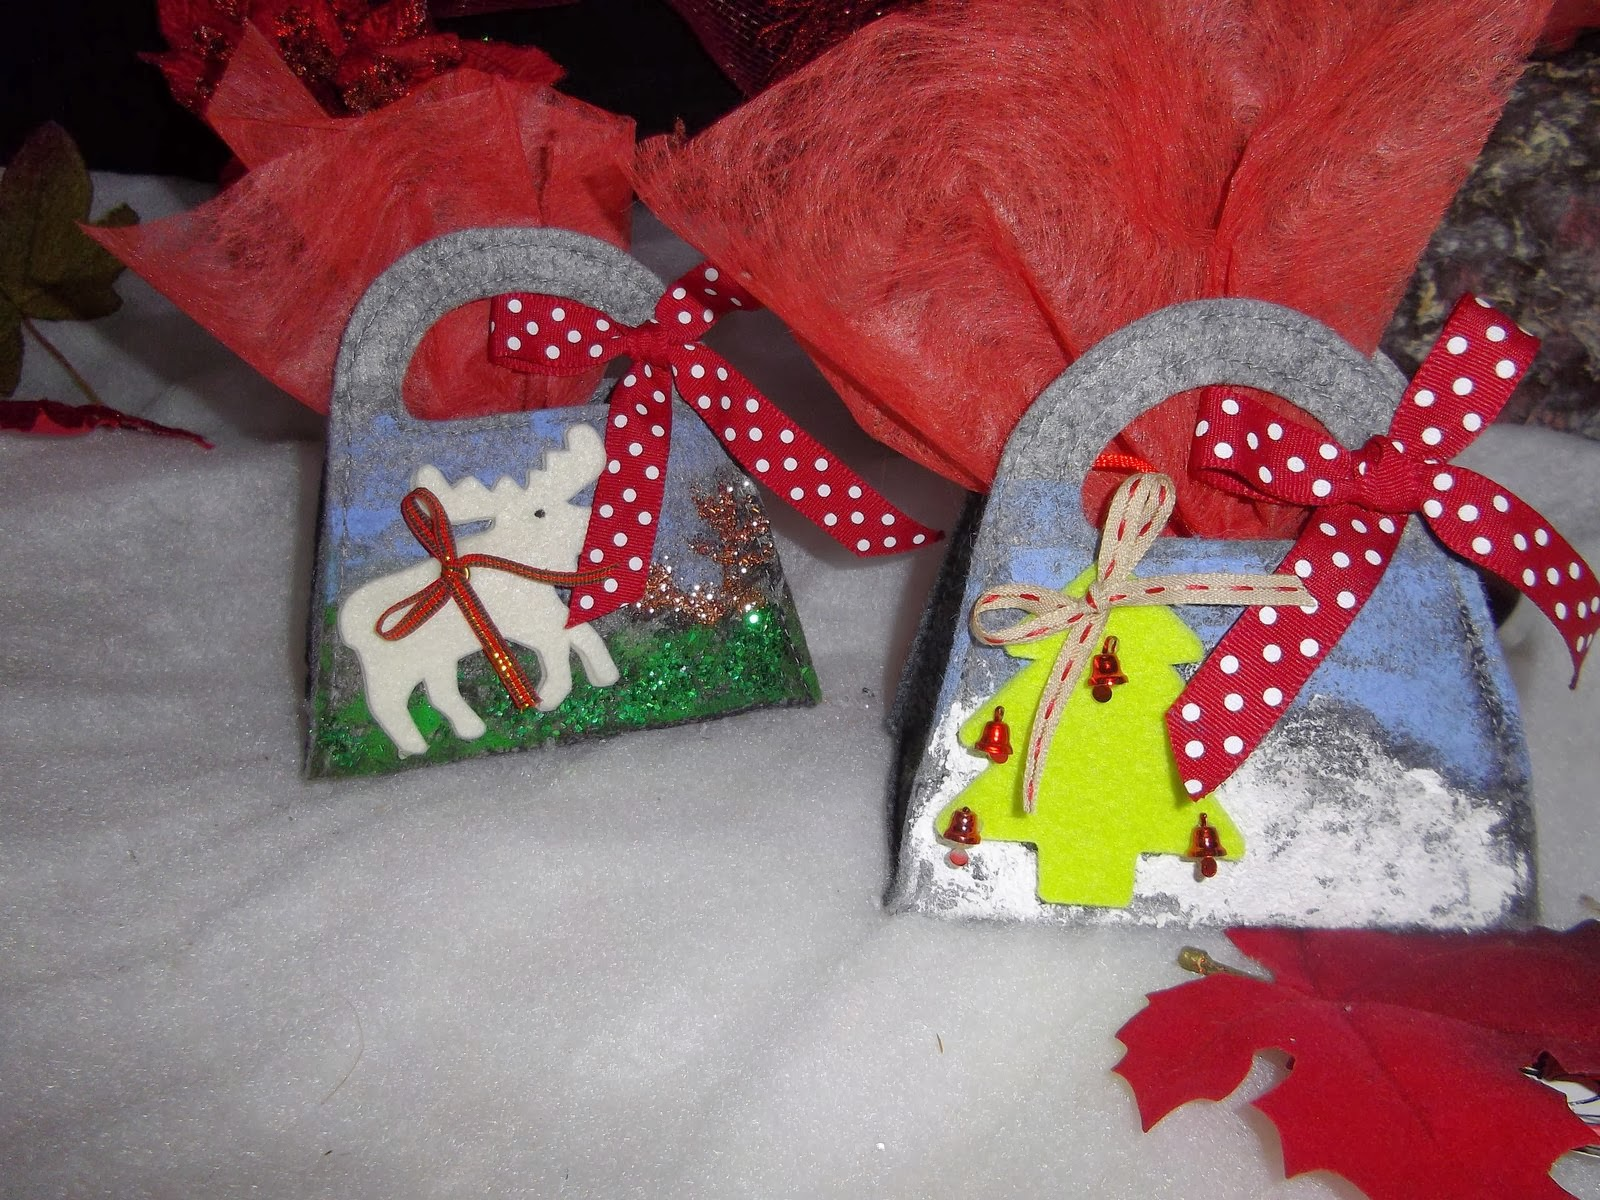 f5ad98aef5d Amanda's Handmade Creations: Χειροποίητες ιδέες για εορταστικούς ...